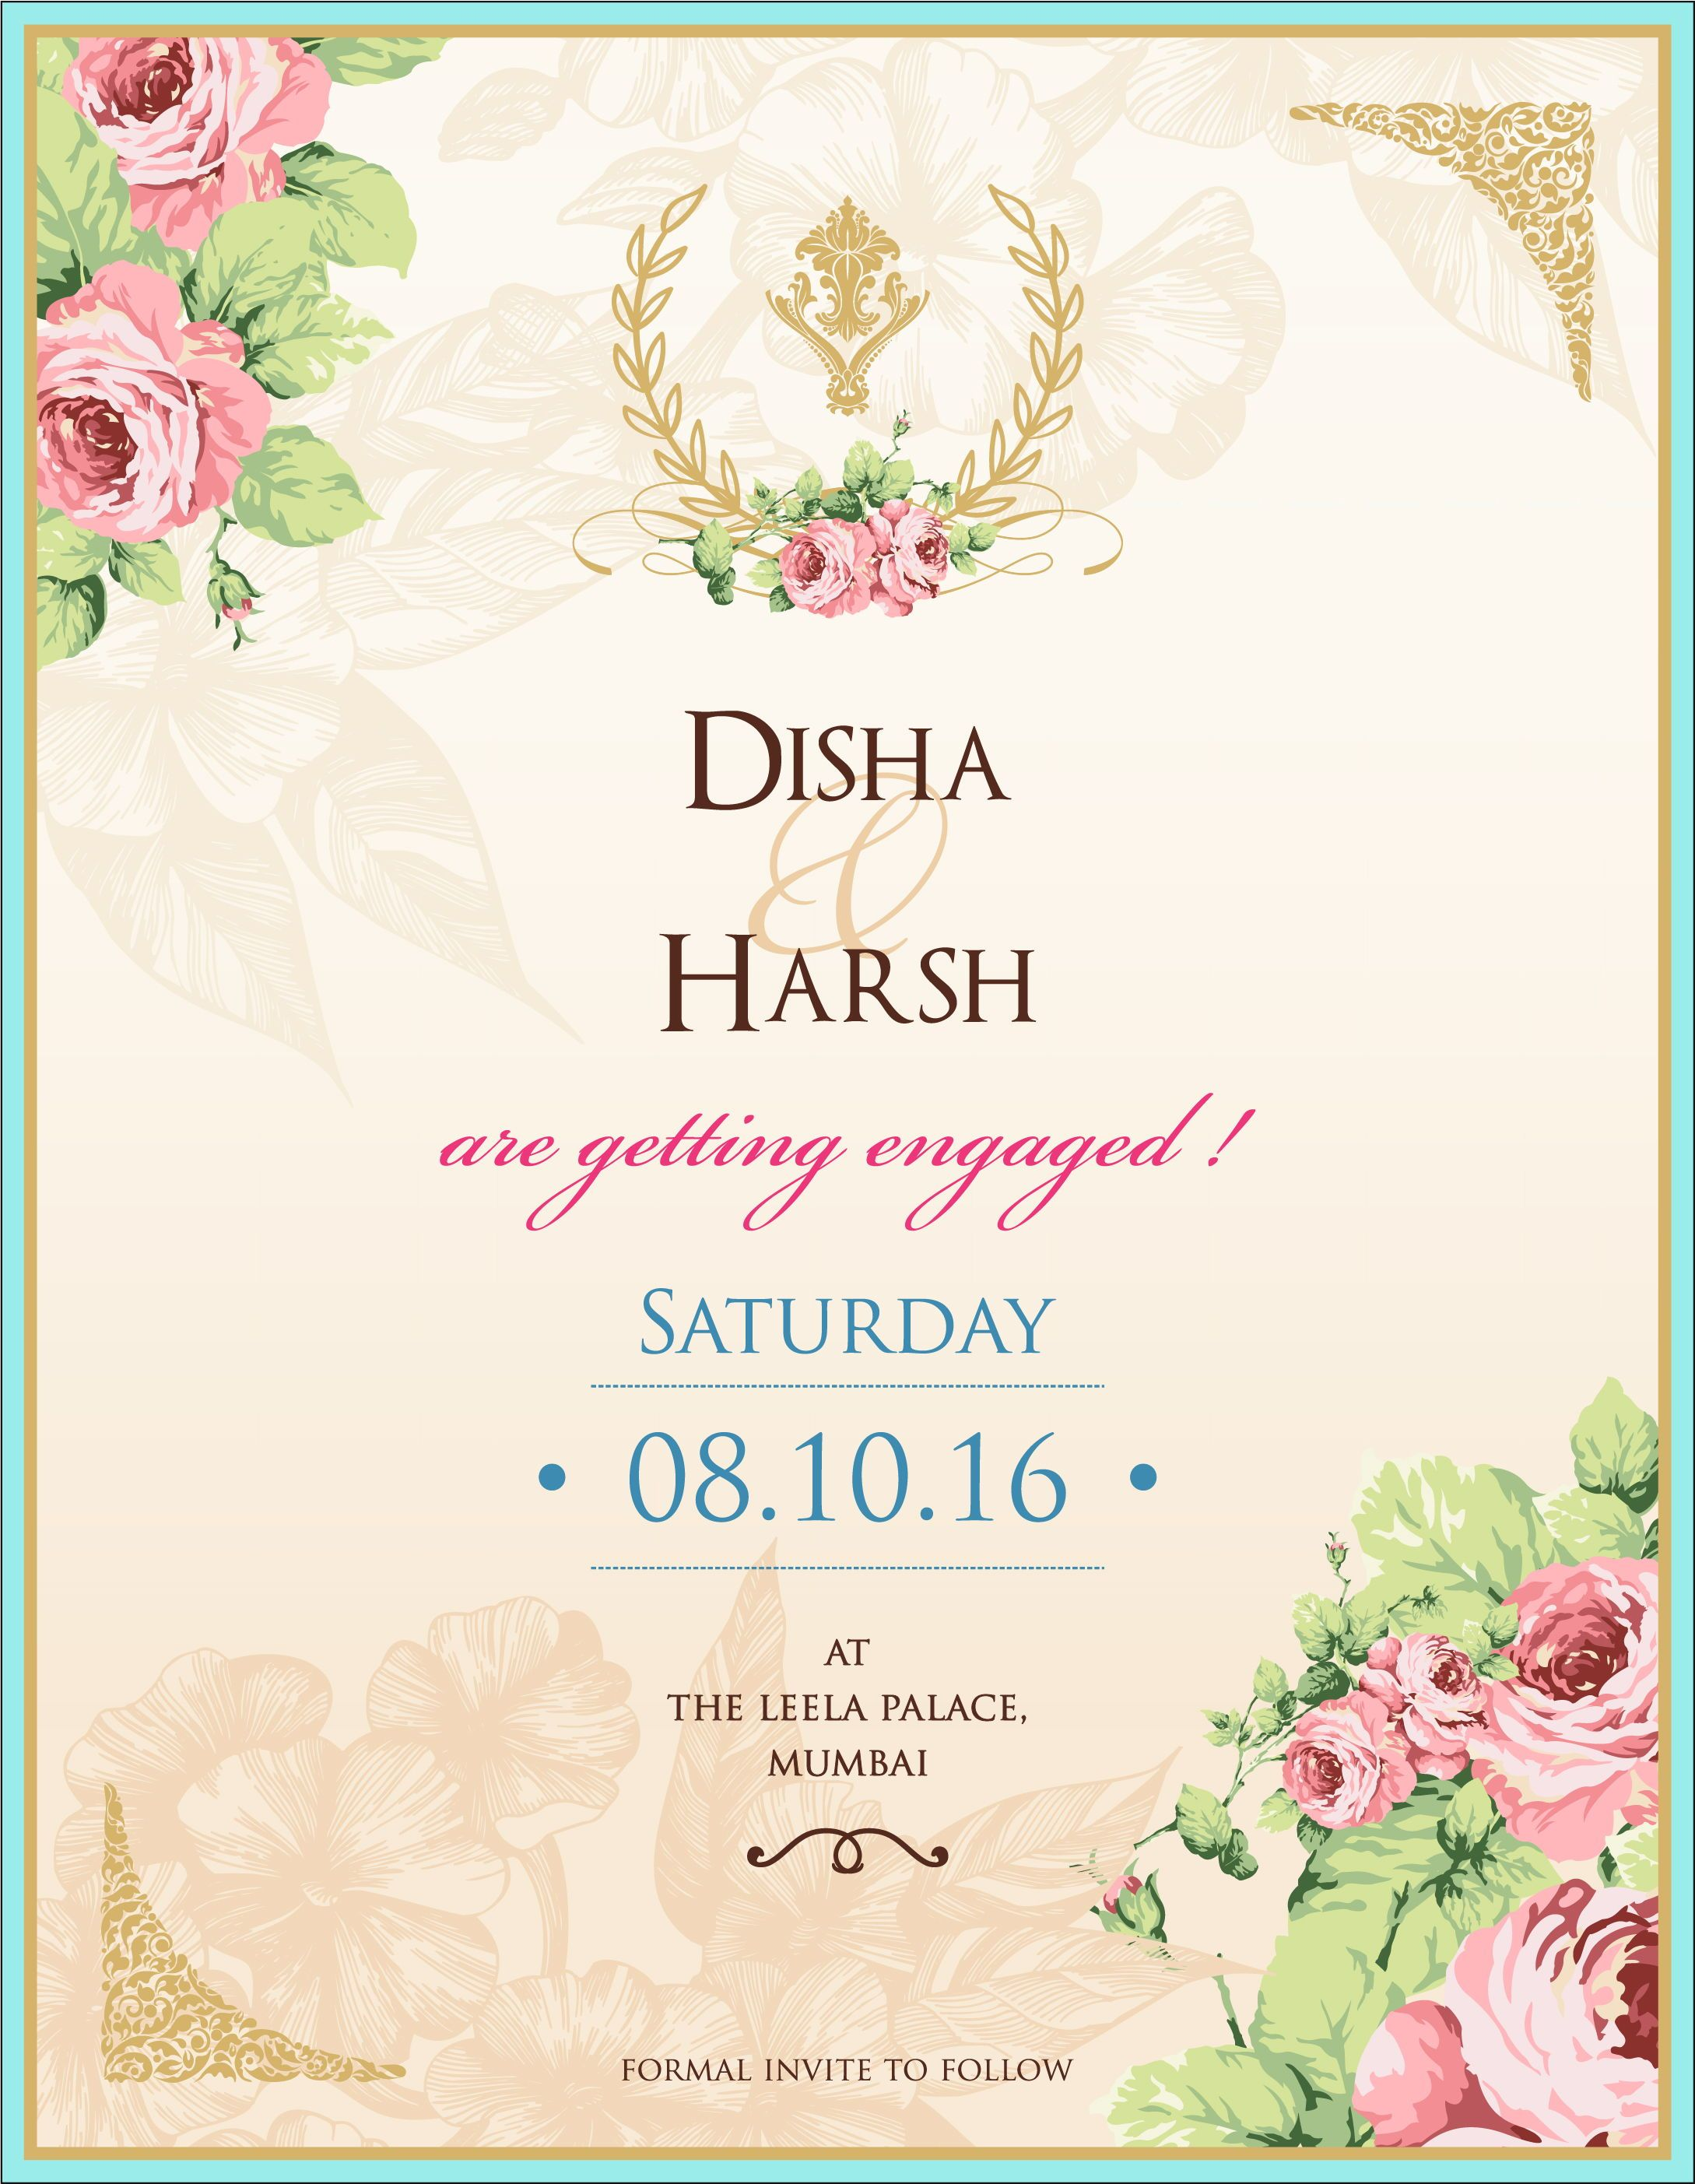 Wedding invitation cards, Indian wedding cards, invites